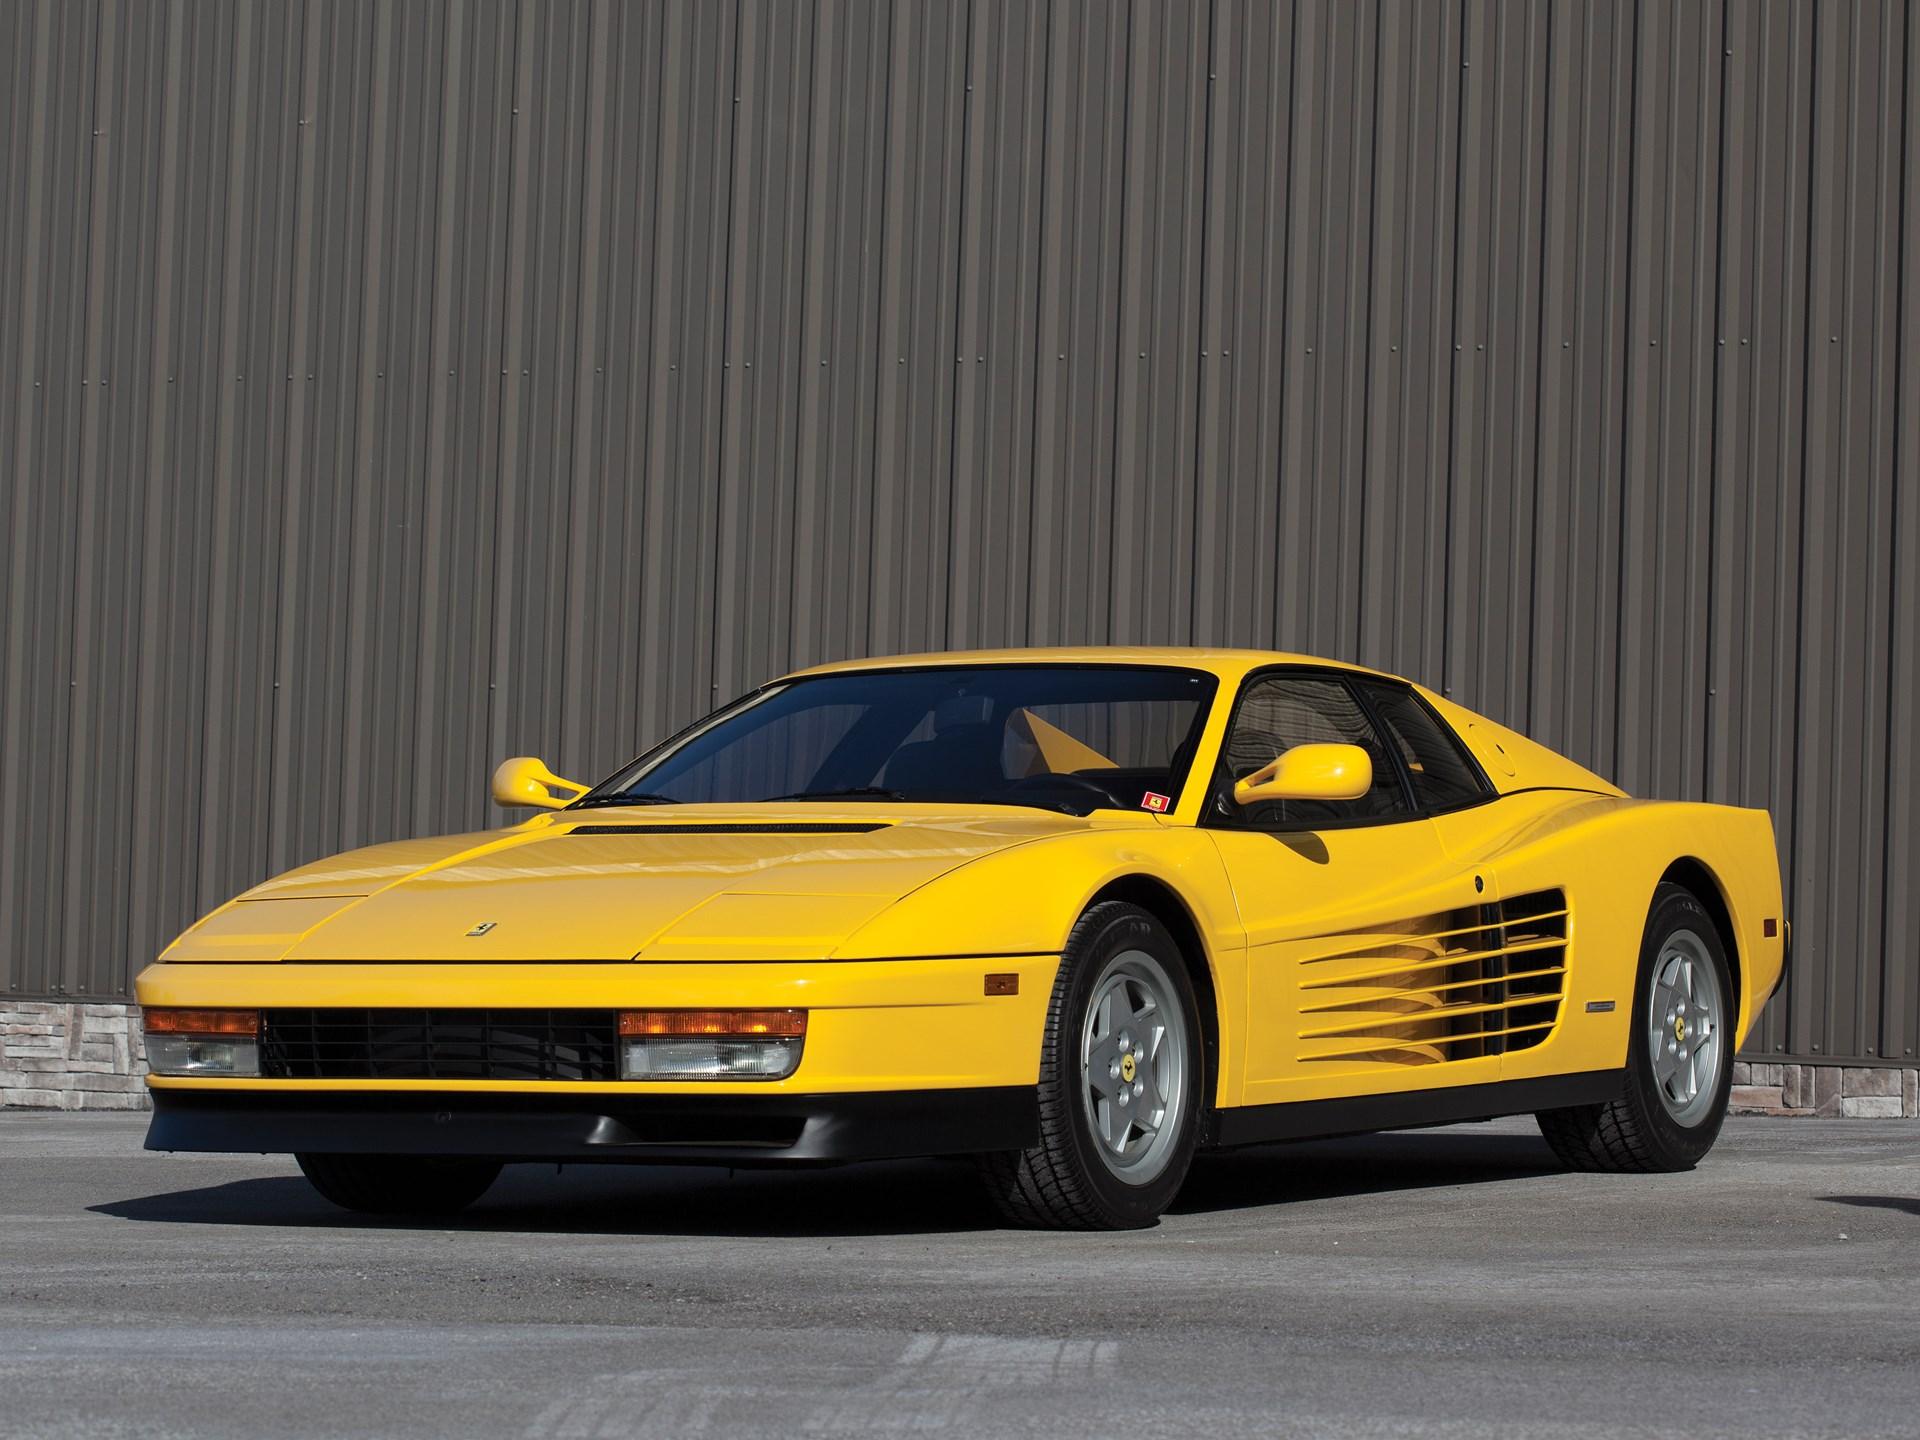 RM Sotheby's - 1991 Ferrari Testarossa | Amelia Island 2017